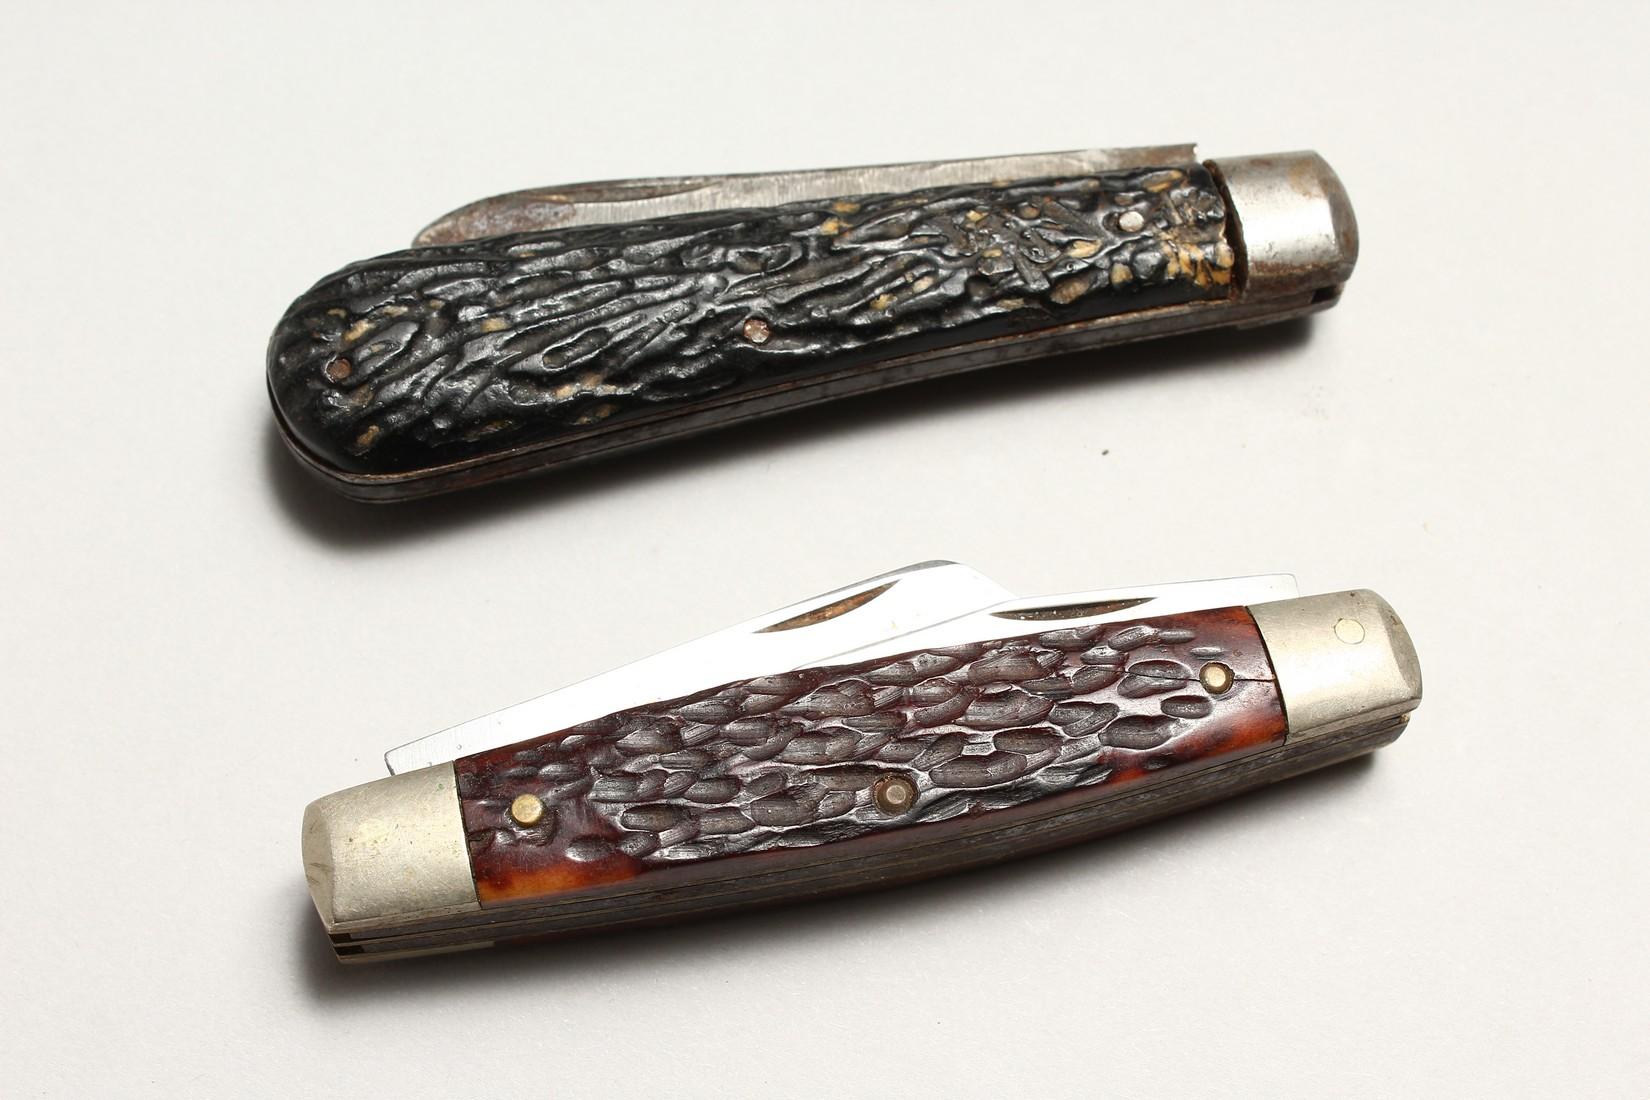 TWO SHEFFIELD WOSTERHOLM PEN KNIVES - Image 2 of 5